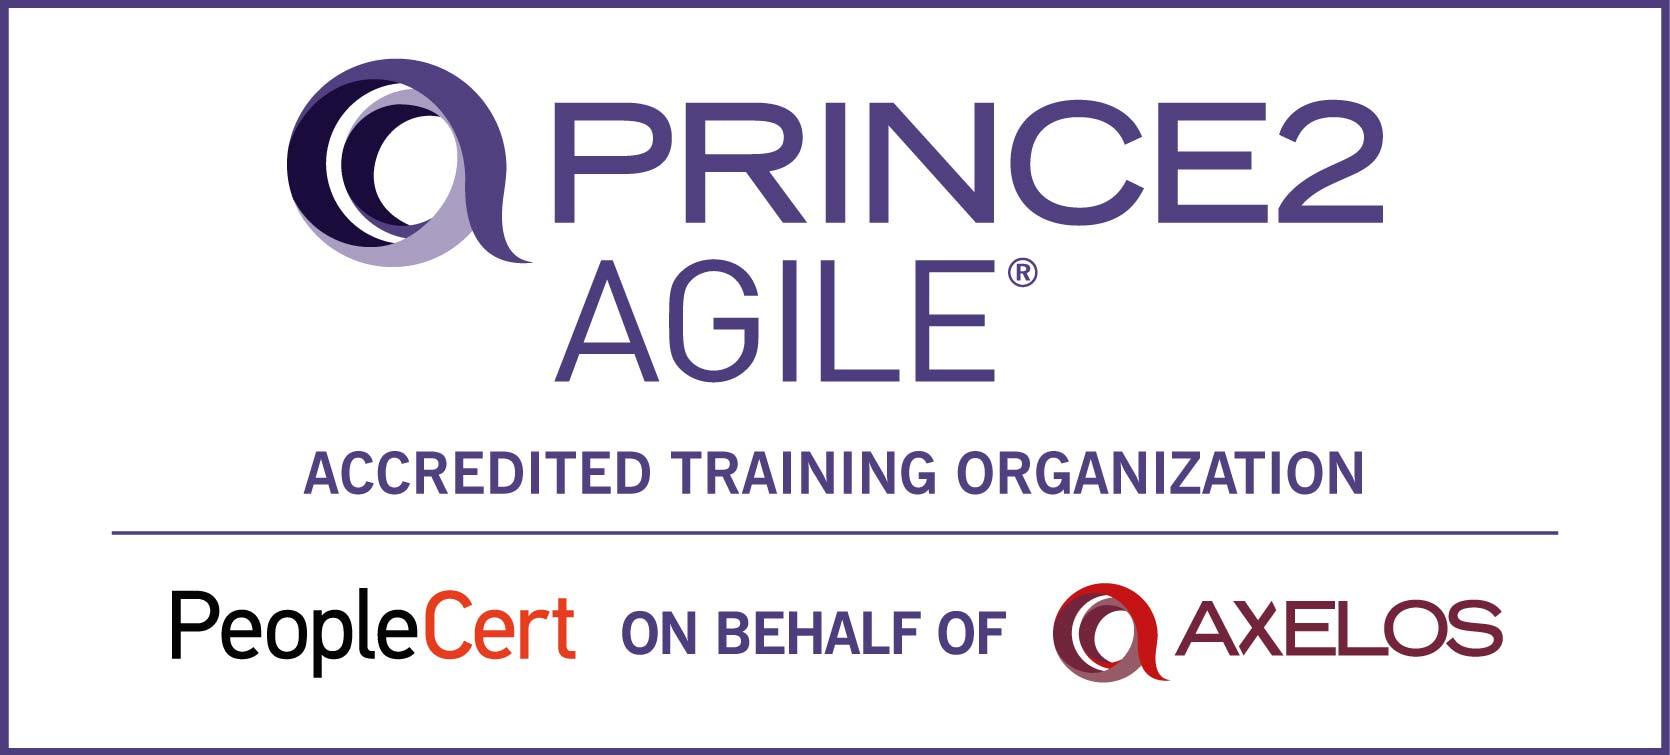 Prince2 agile akkrediteret organisation